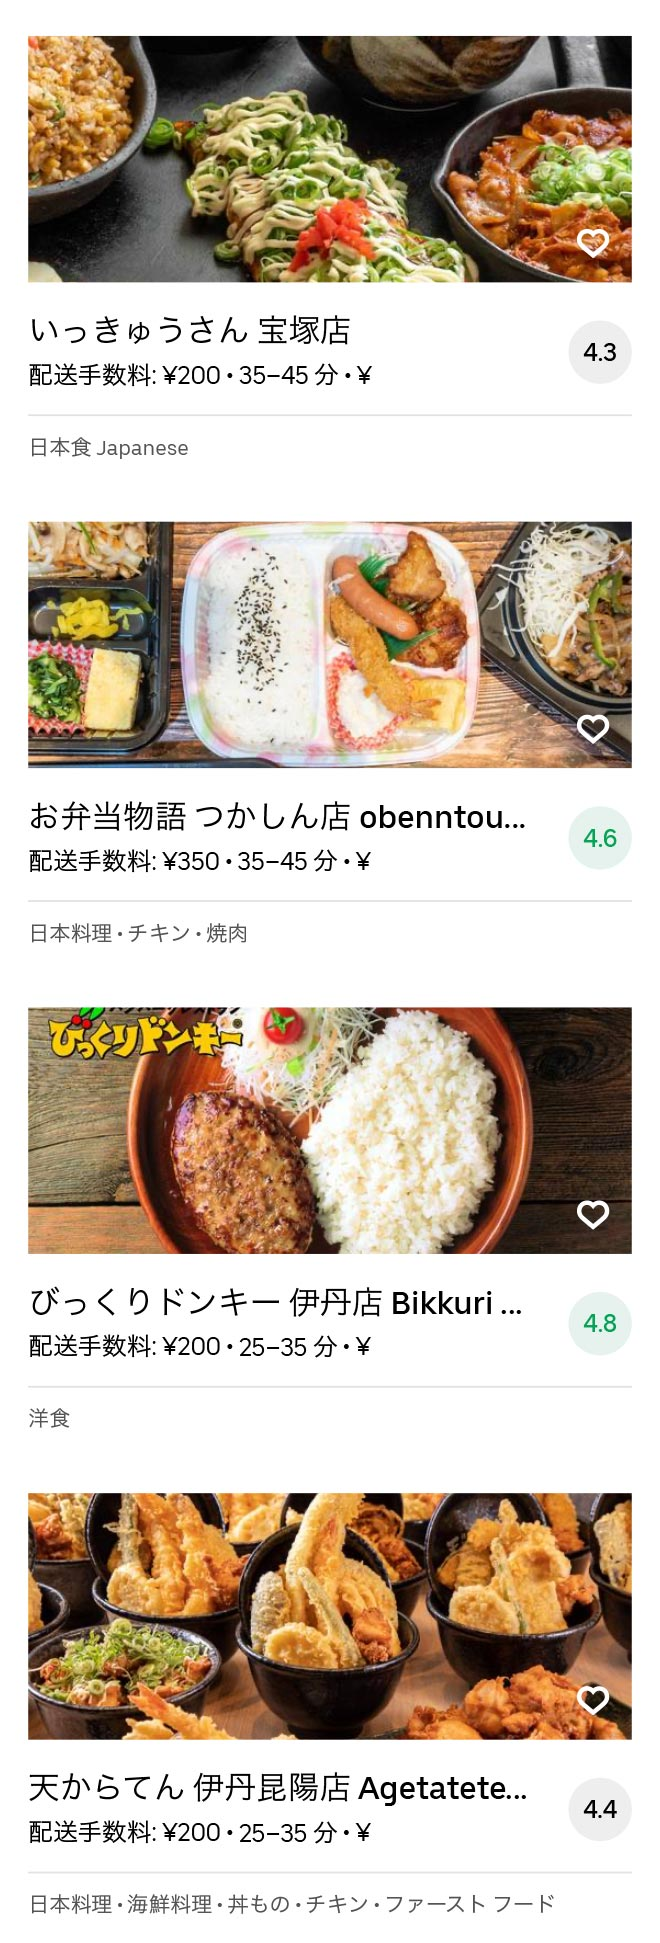 Itami sakuradai menu 2007 06